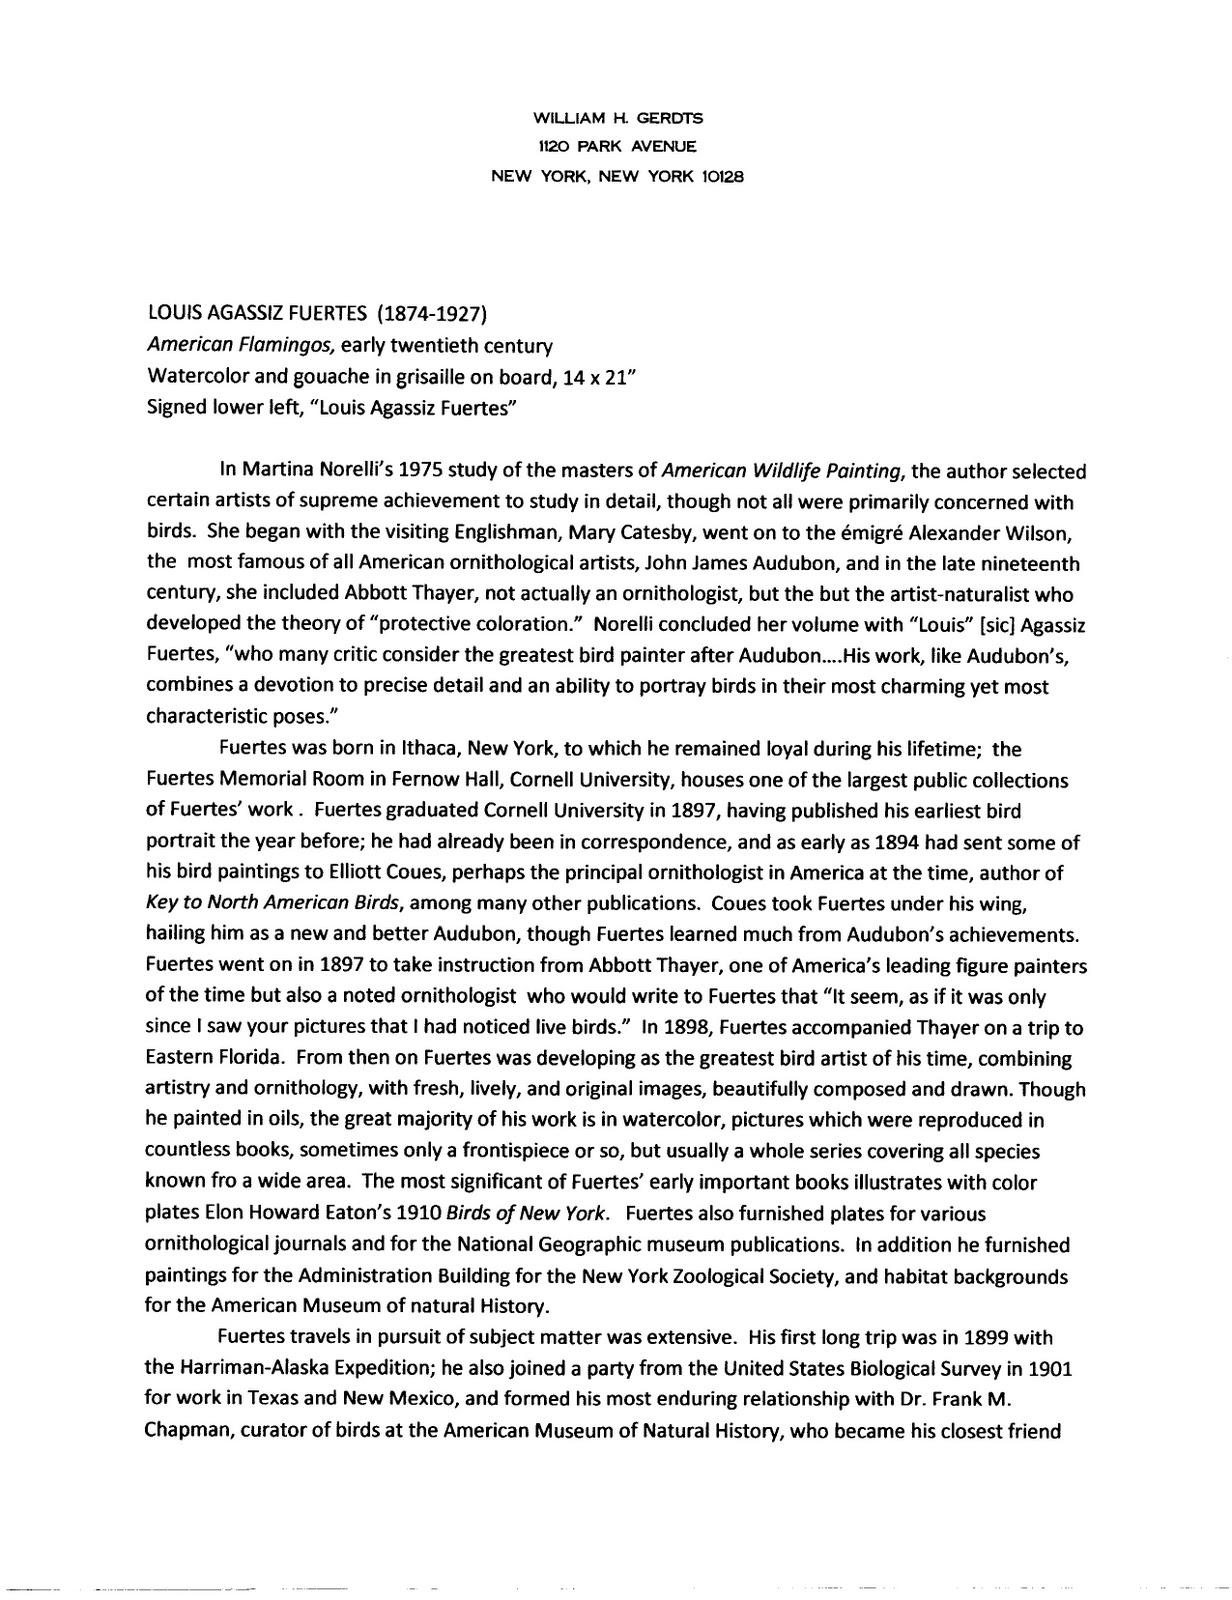 001 Fuertes20american20flamingos20001 Essay Example Grad Stupendous School Tips Graduate Speech Pathology Admission Format Full